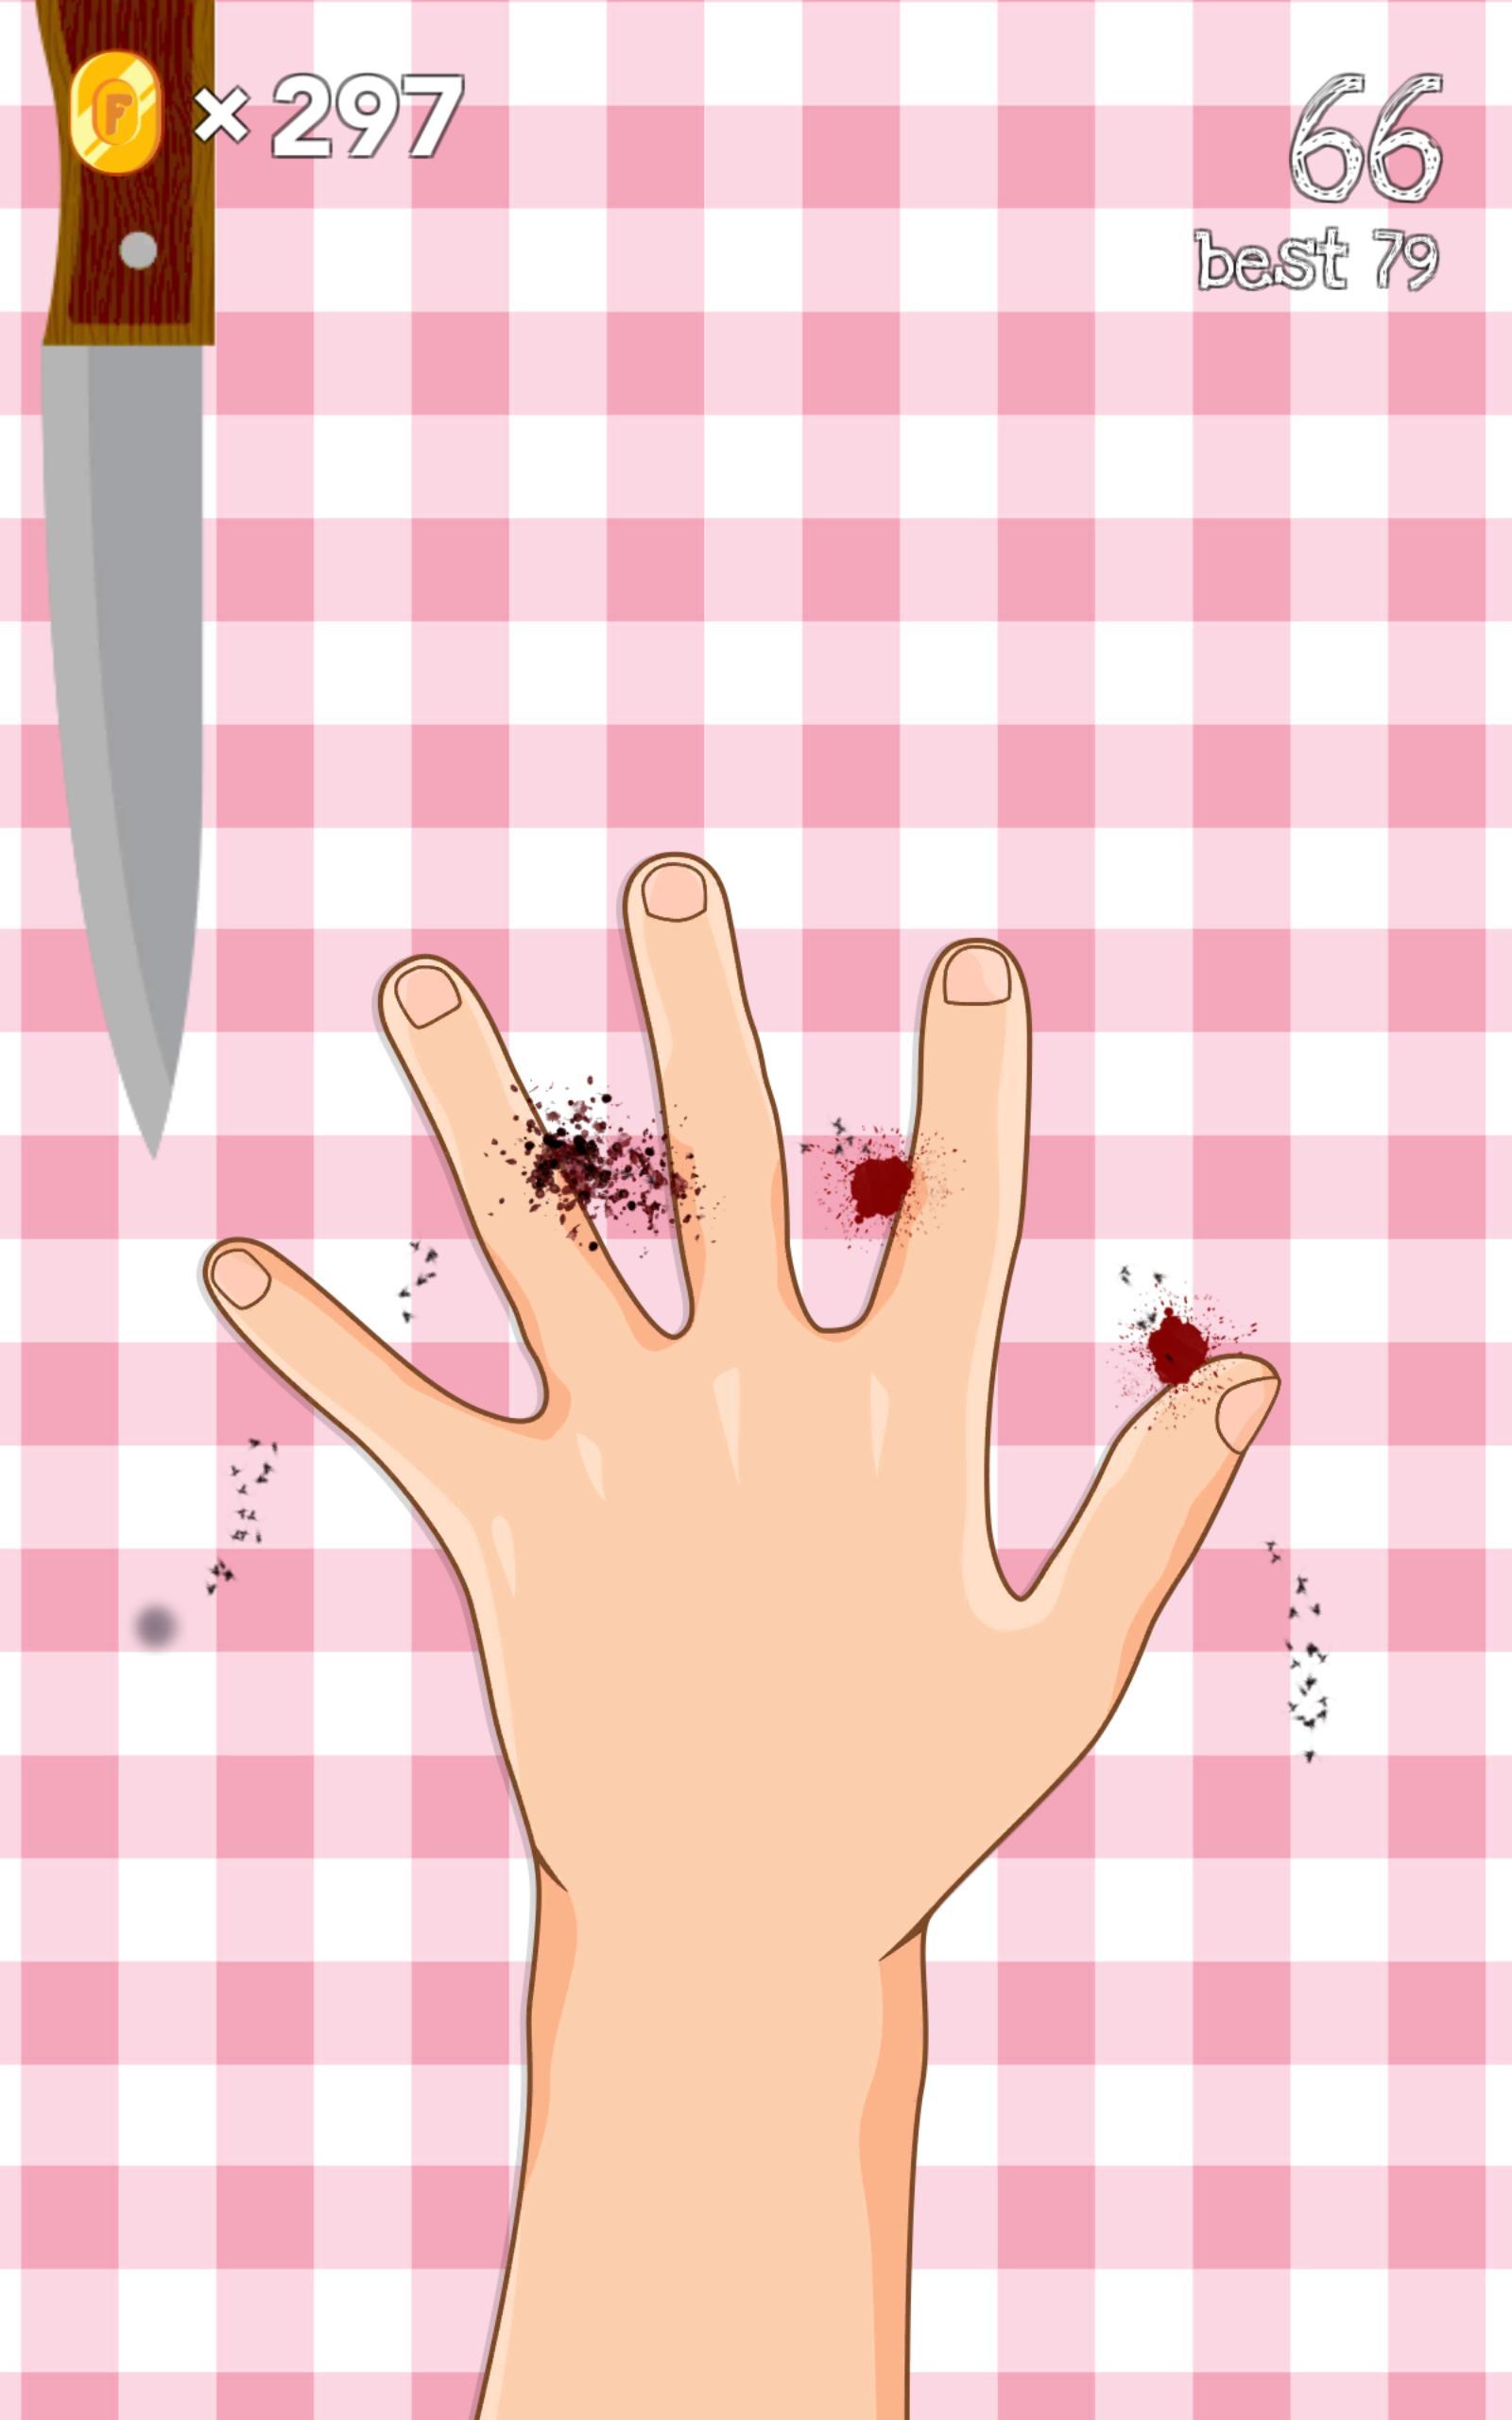 4 Fingers - free knife games 3.4 Screenshot 9